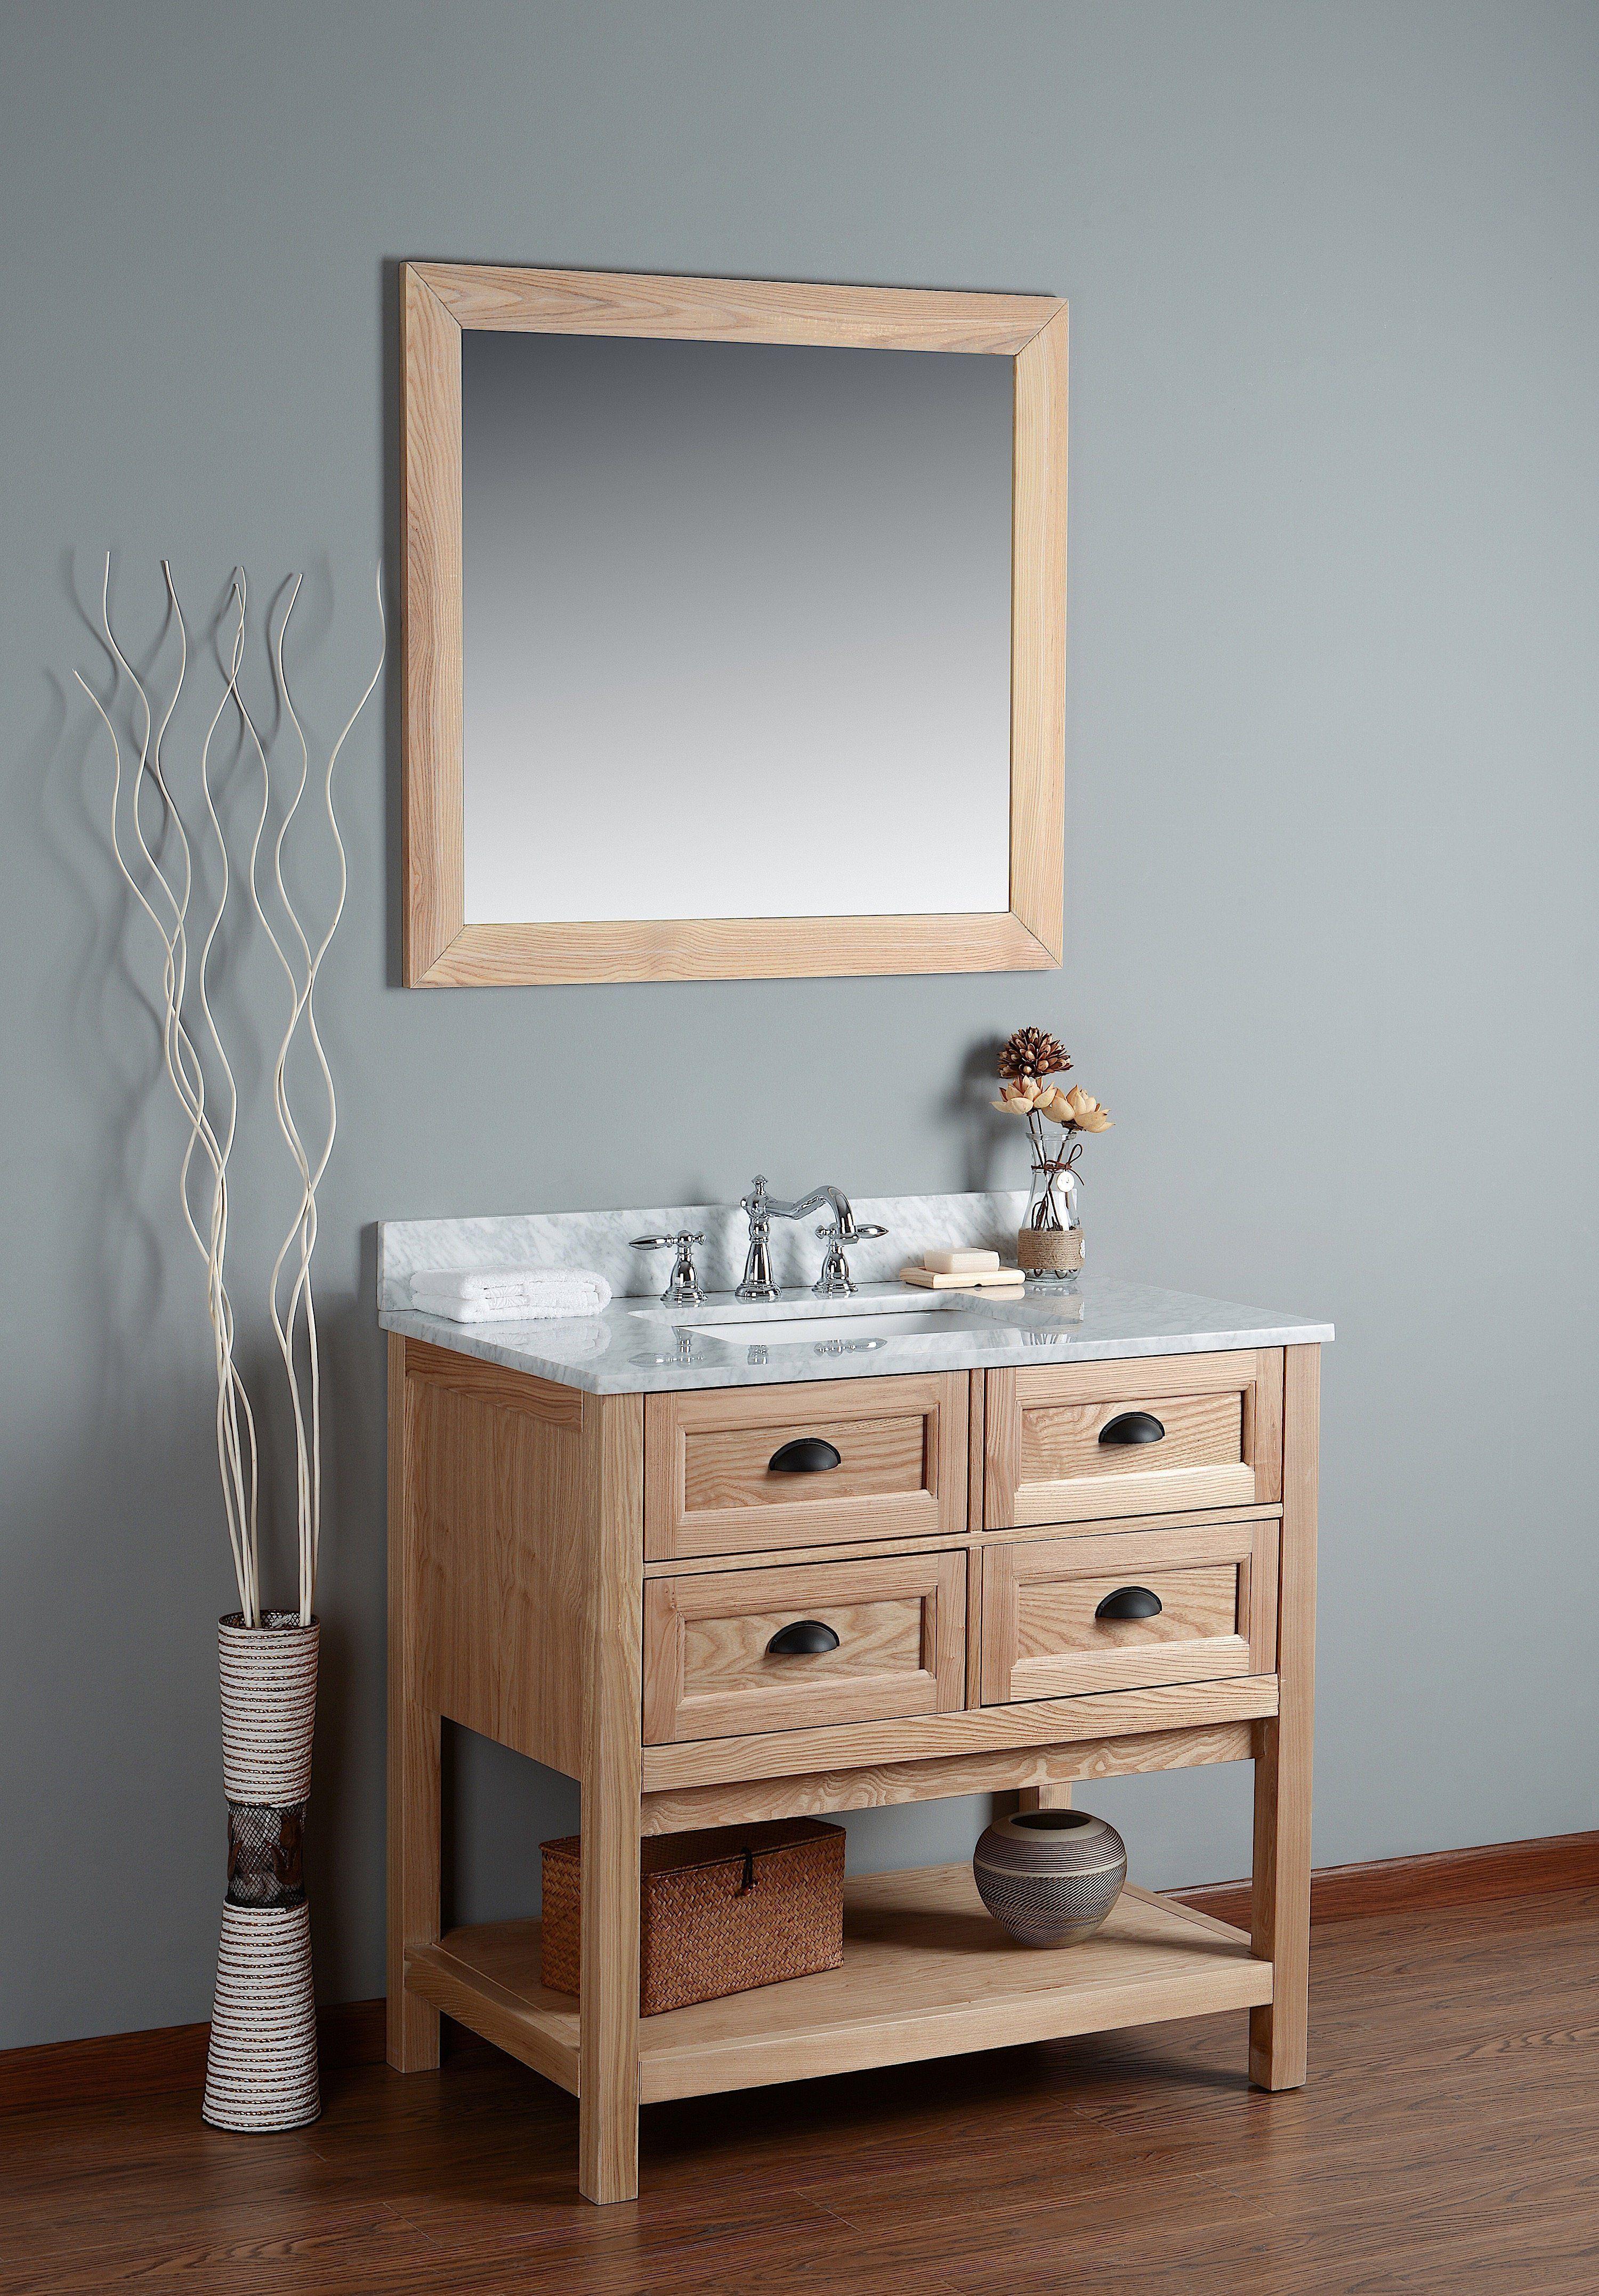 Rubeza 36 Allwood Bathroom Vanity Combo Set White Italian Marble Carrara Top Marblebathrooms Bathroom Vanity Combo Rustic Bathroom Vanities Vanity Combos